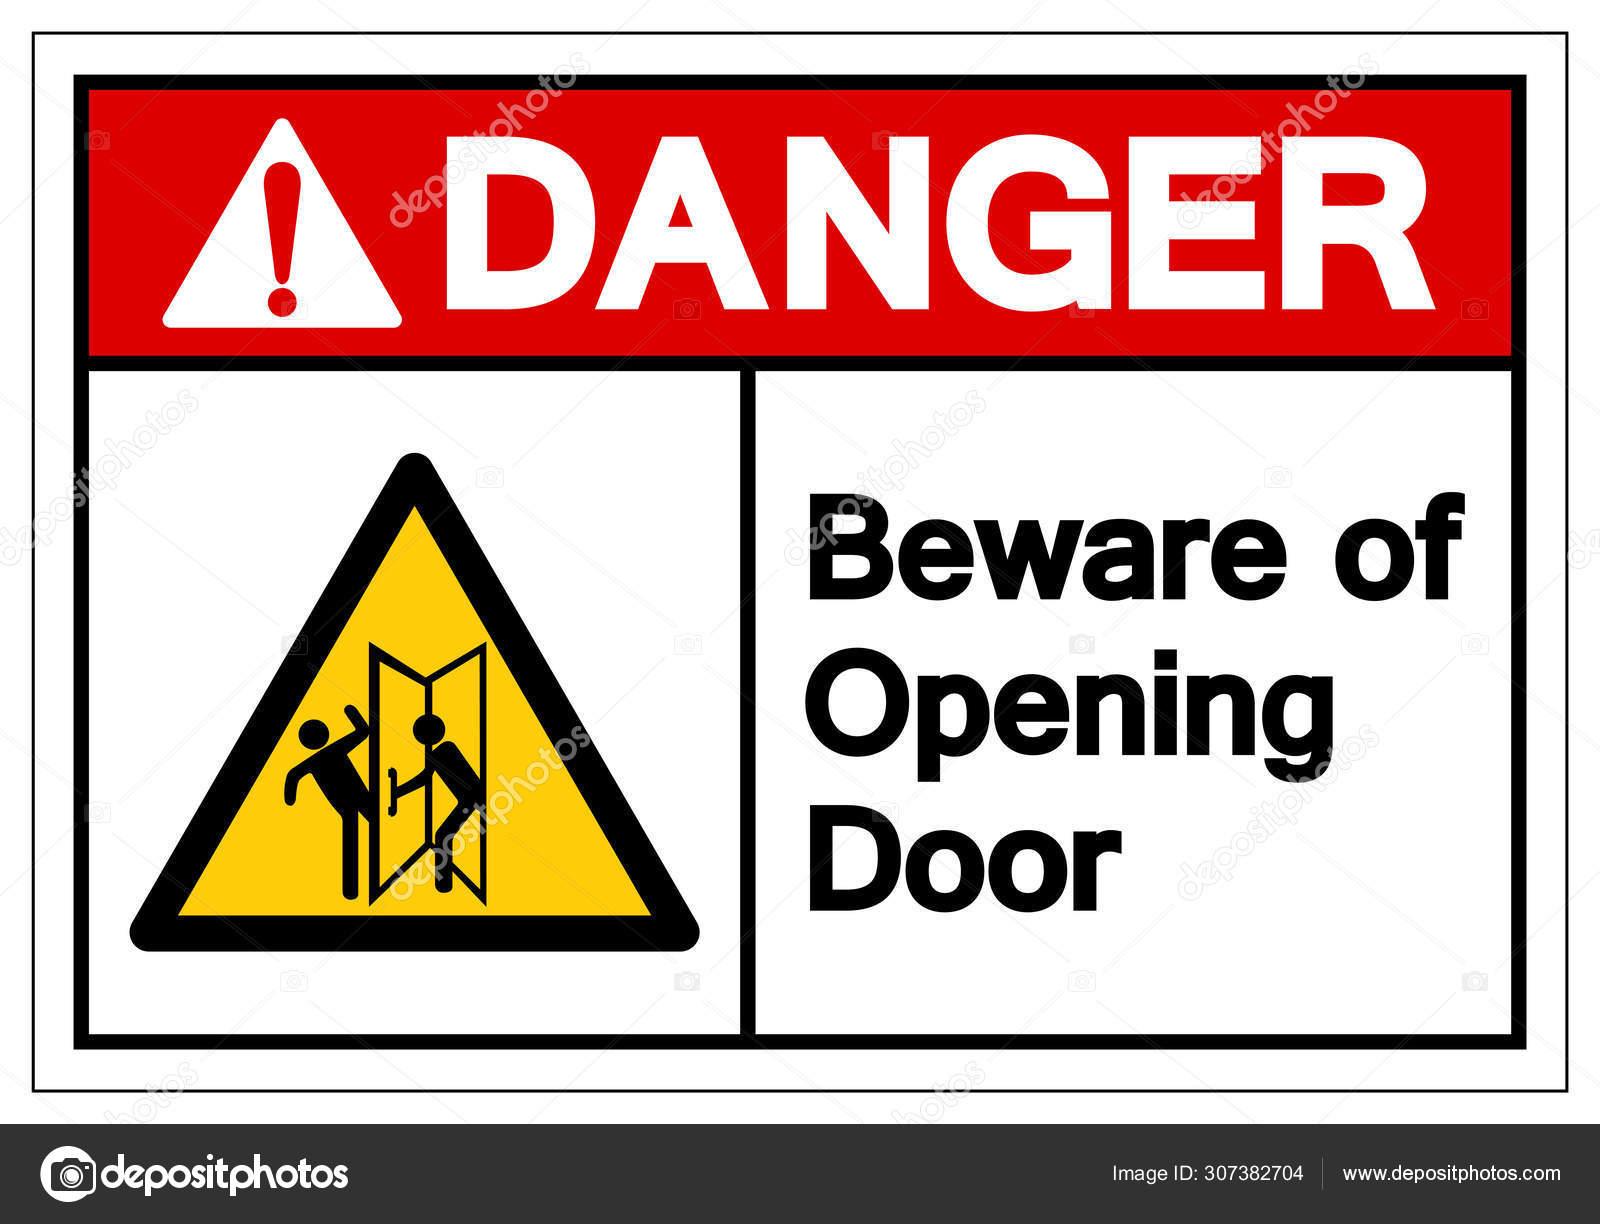 Panneau autocollant de s/écurit/é /«/This door is alarmed for use in emergency only//»150 mm x 50 mm